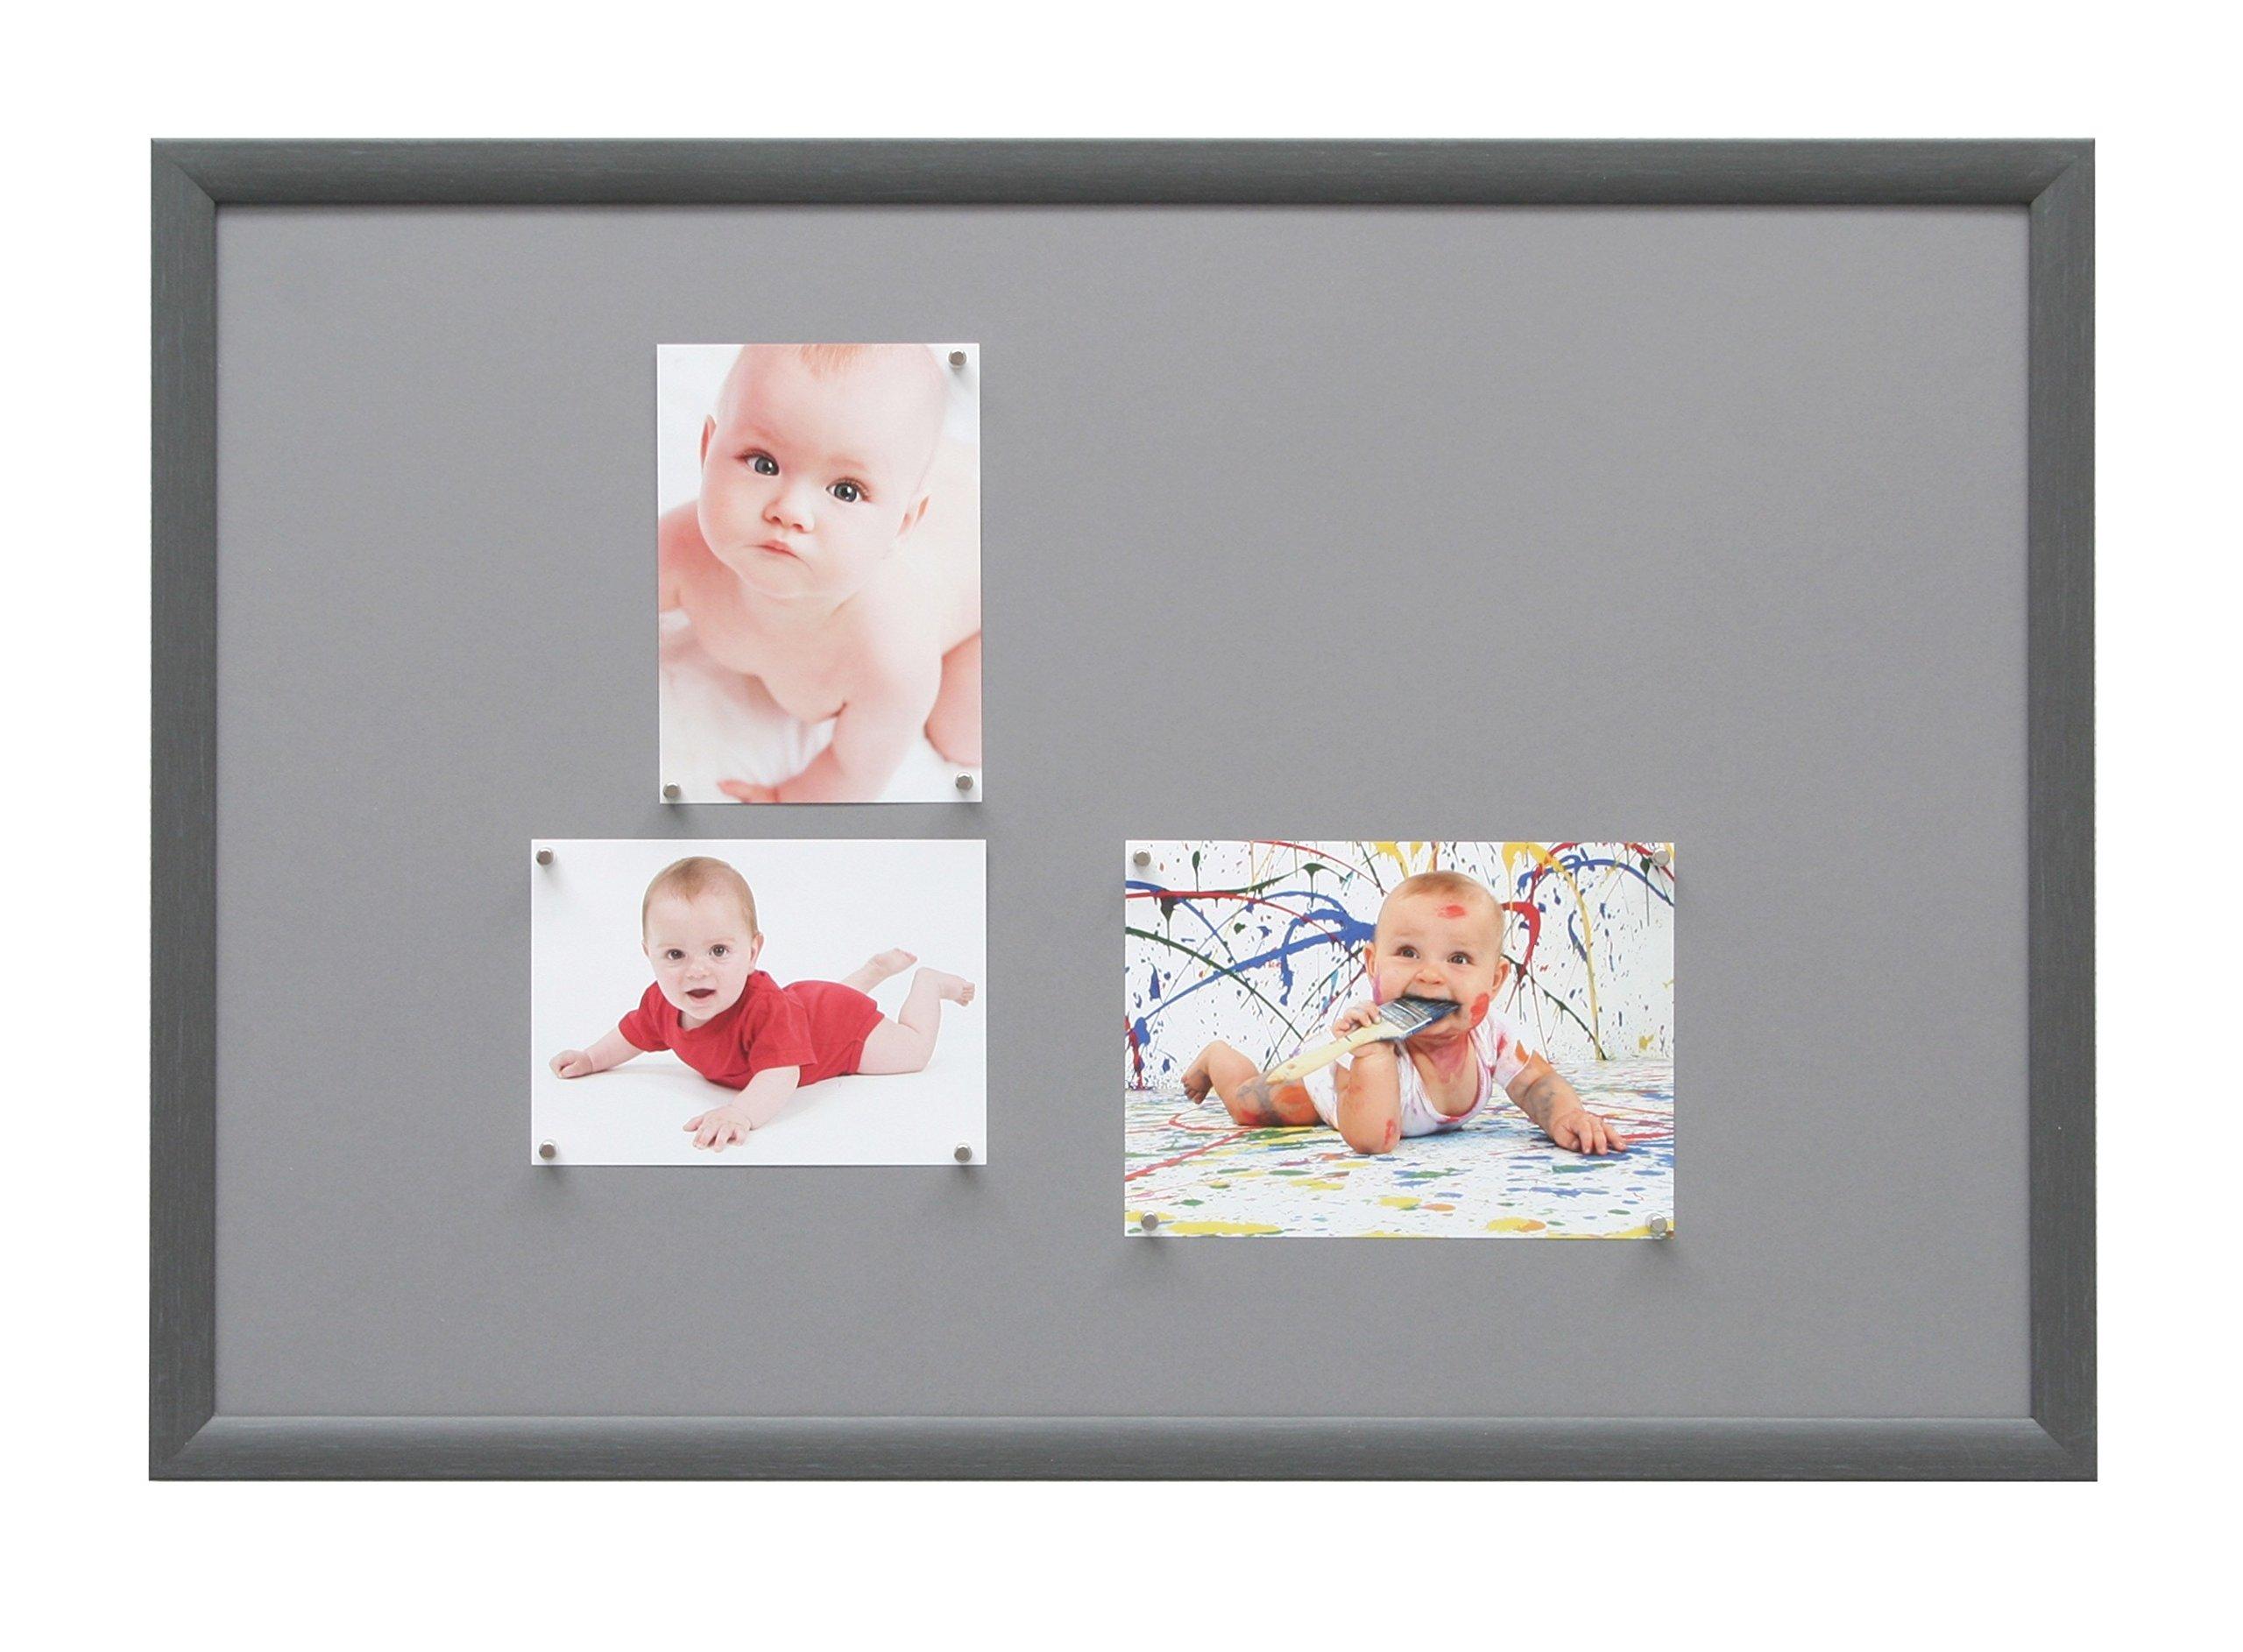 Deknudt Frames S54ST8-40.0X60.0 Magnetic Wooden Board S54SF7 Painted Grey 64.4 x 44.4 x 1.5 cm